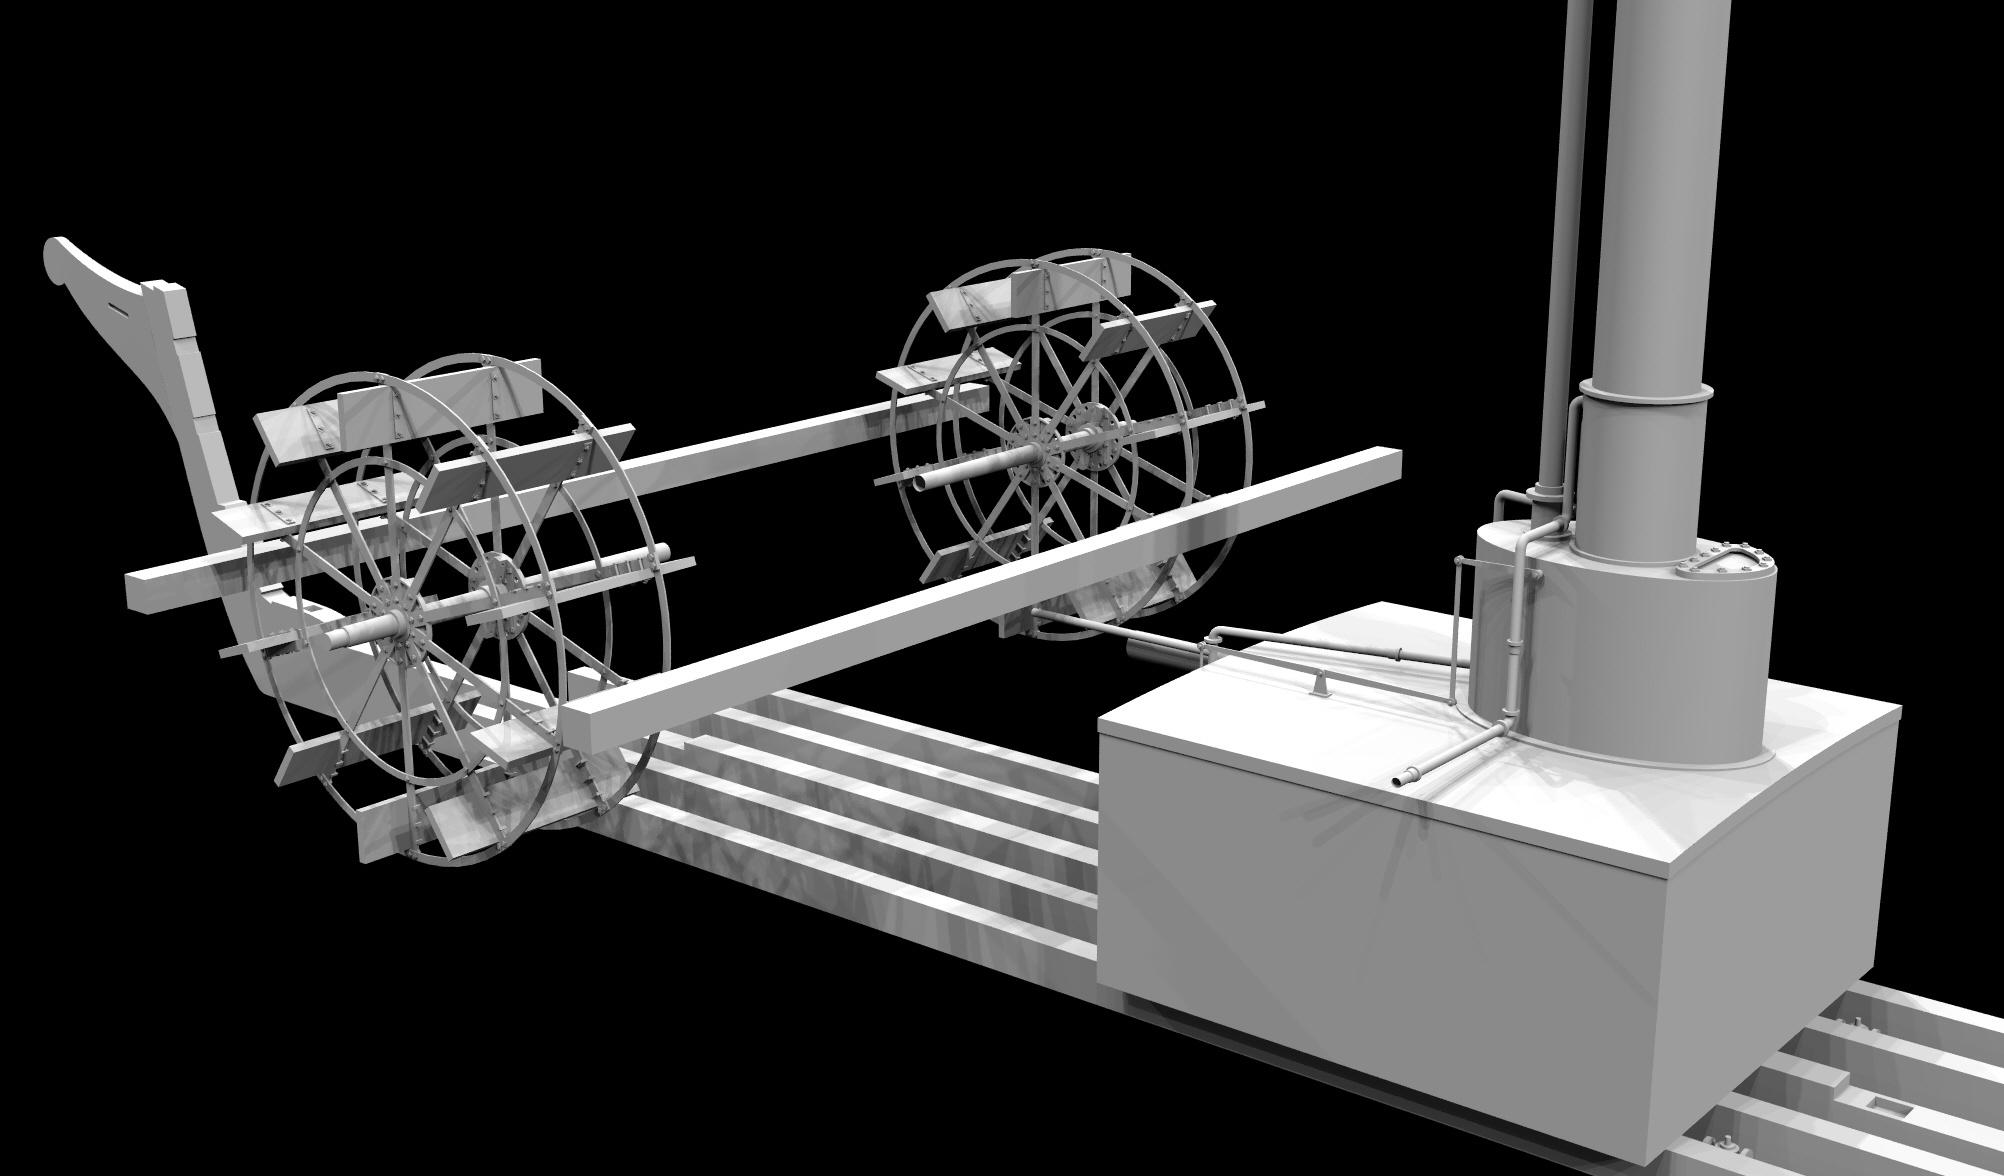 S.S. Beaver - Engine Room